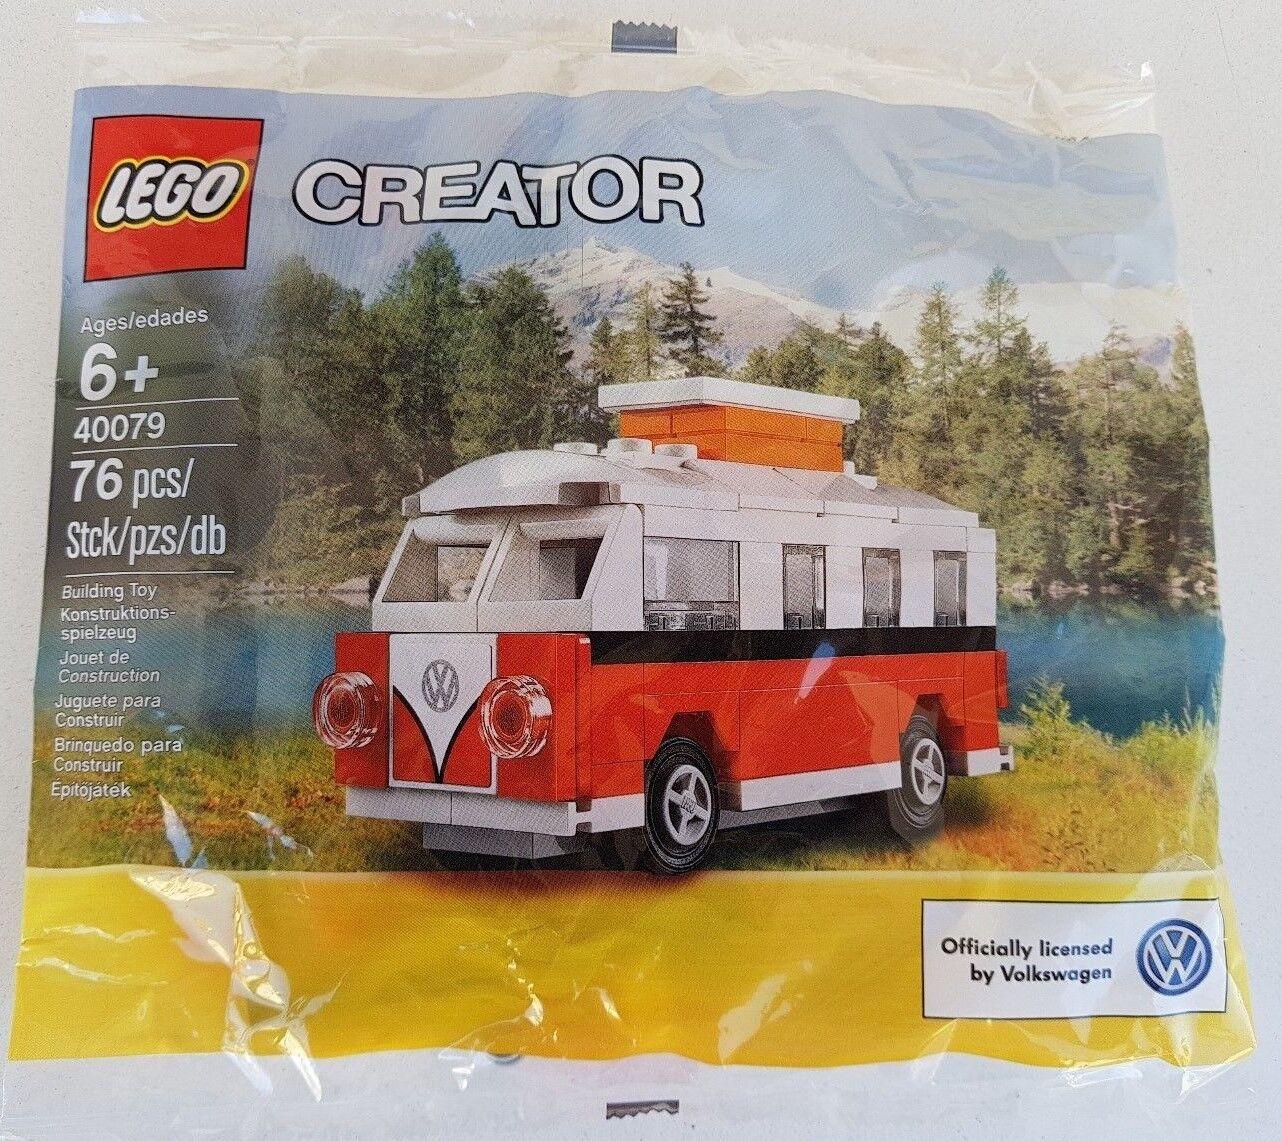 Lego ® Creator 40079 mini VW volkswaagen coche matrícula t1 Camper autobús polybag nuevo embalaje original